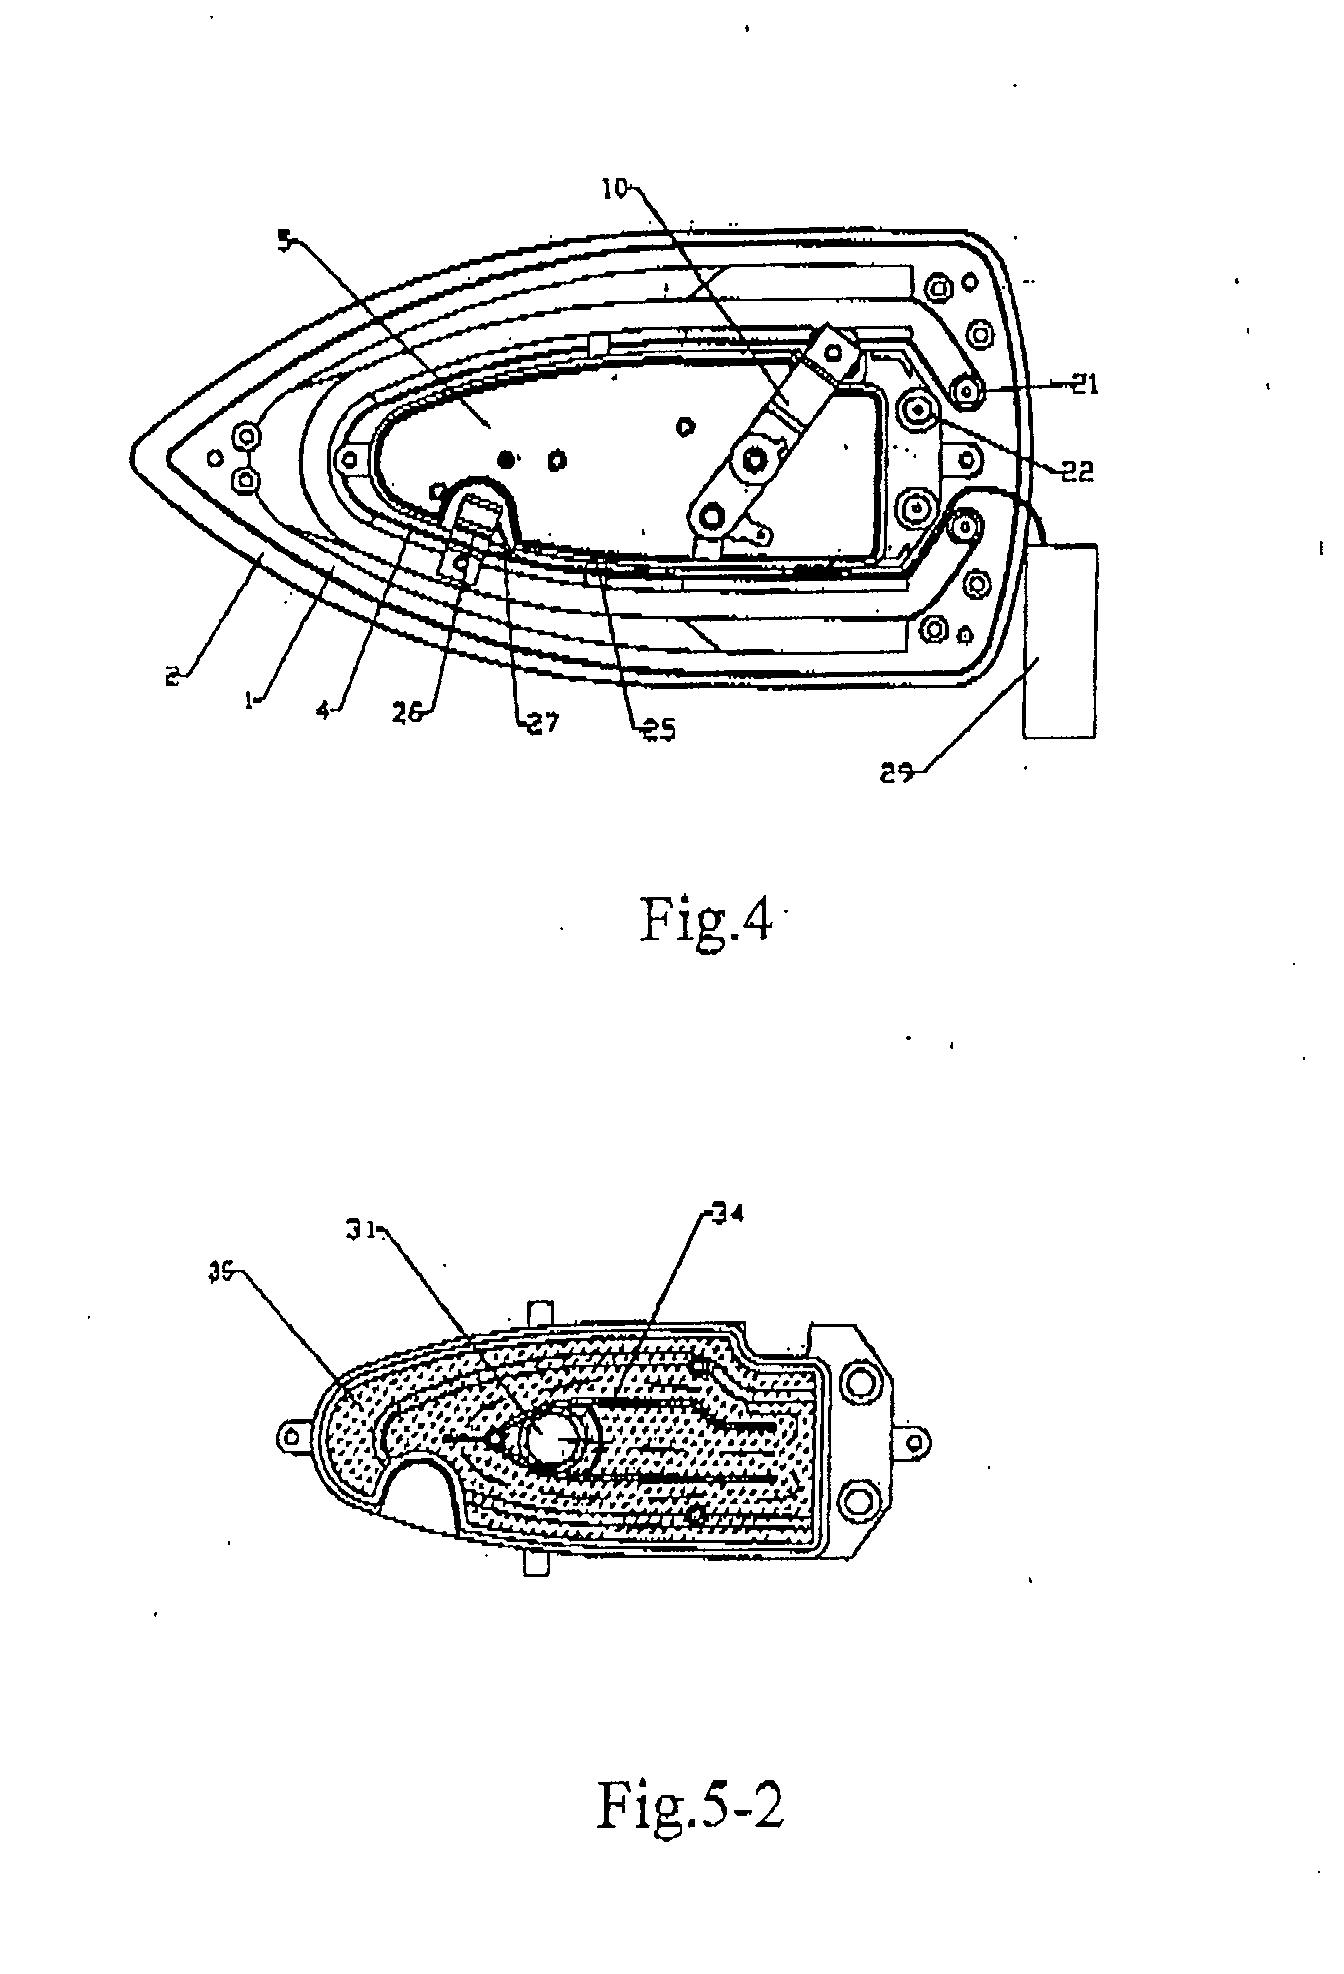 Electric Iron Wiring Diagram : 28 Wiring Diagram Images